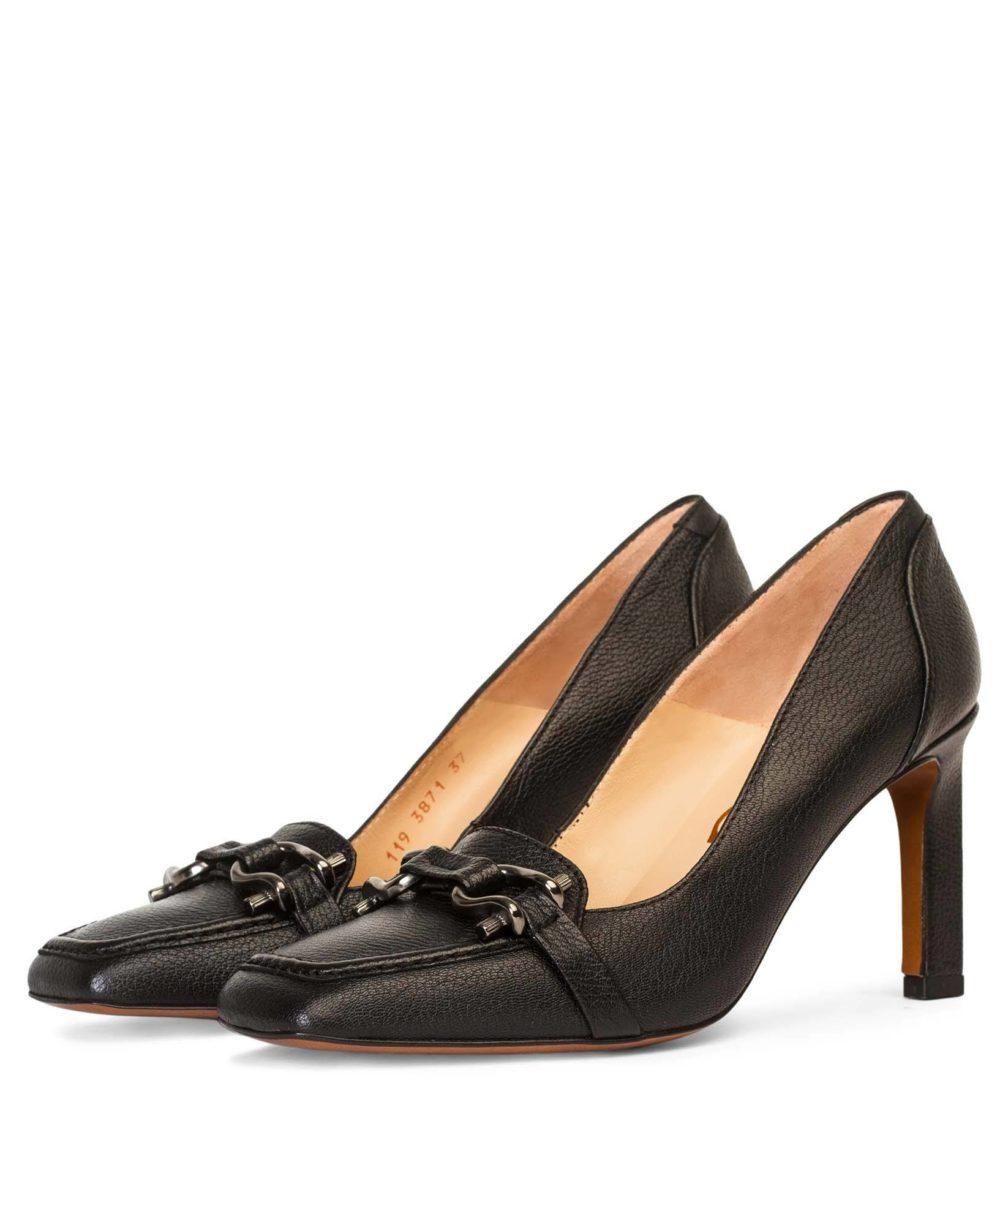 Zapatos de piel Paco GIl - P-3871 Black Bufalo D